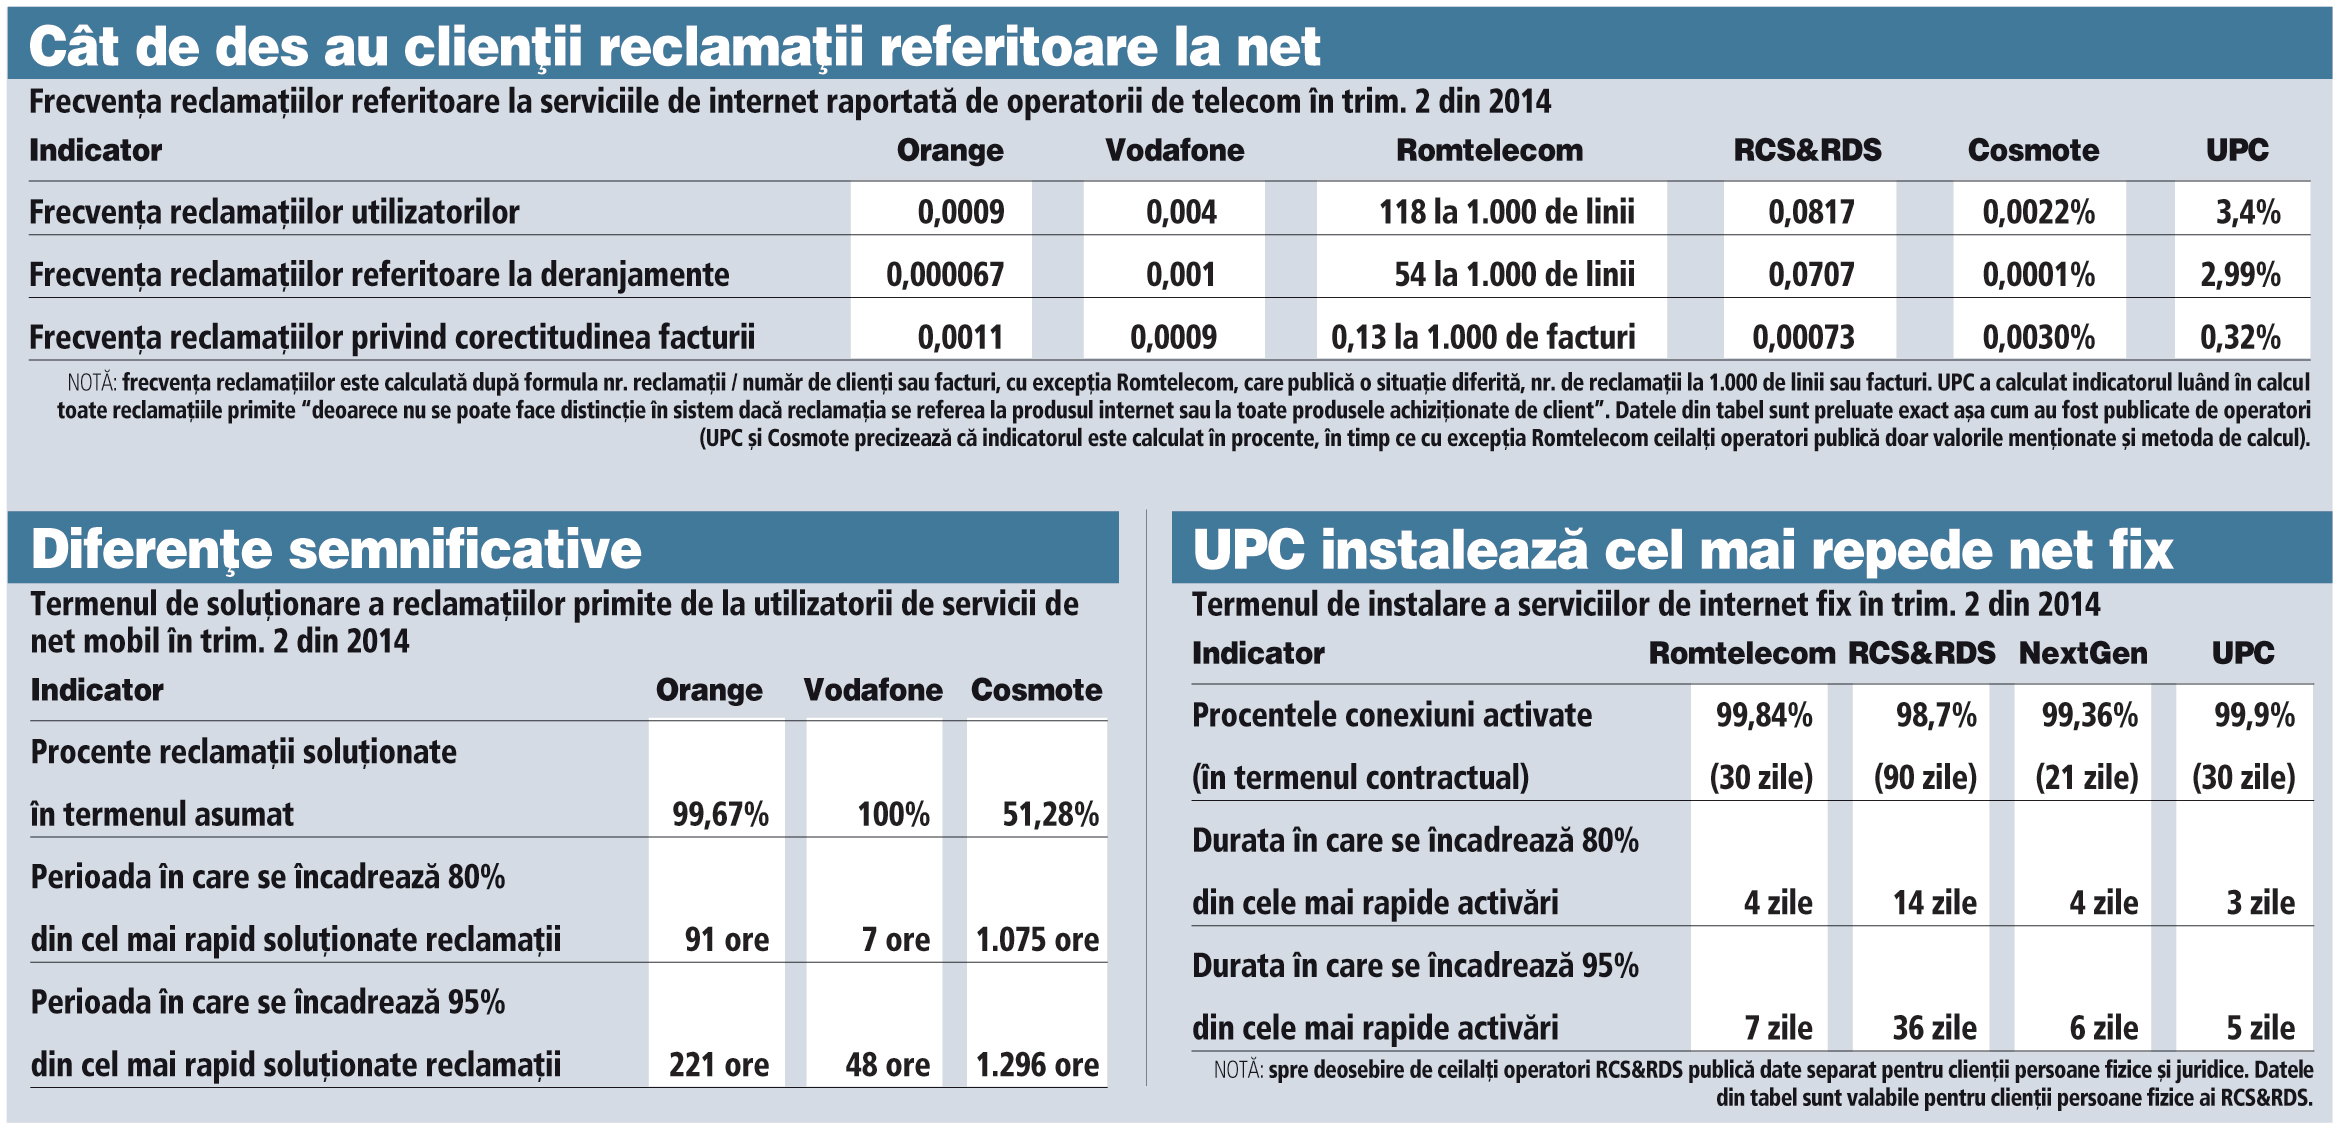 Reclamatii referitoare la net si termen de instalare internet